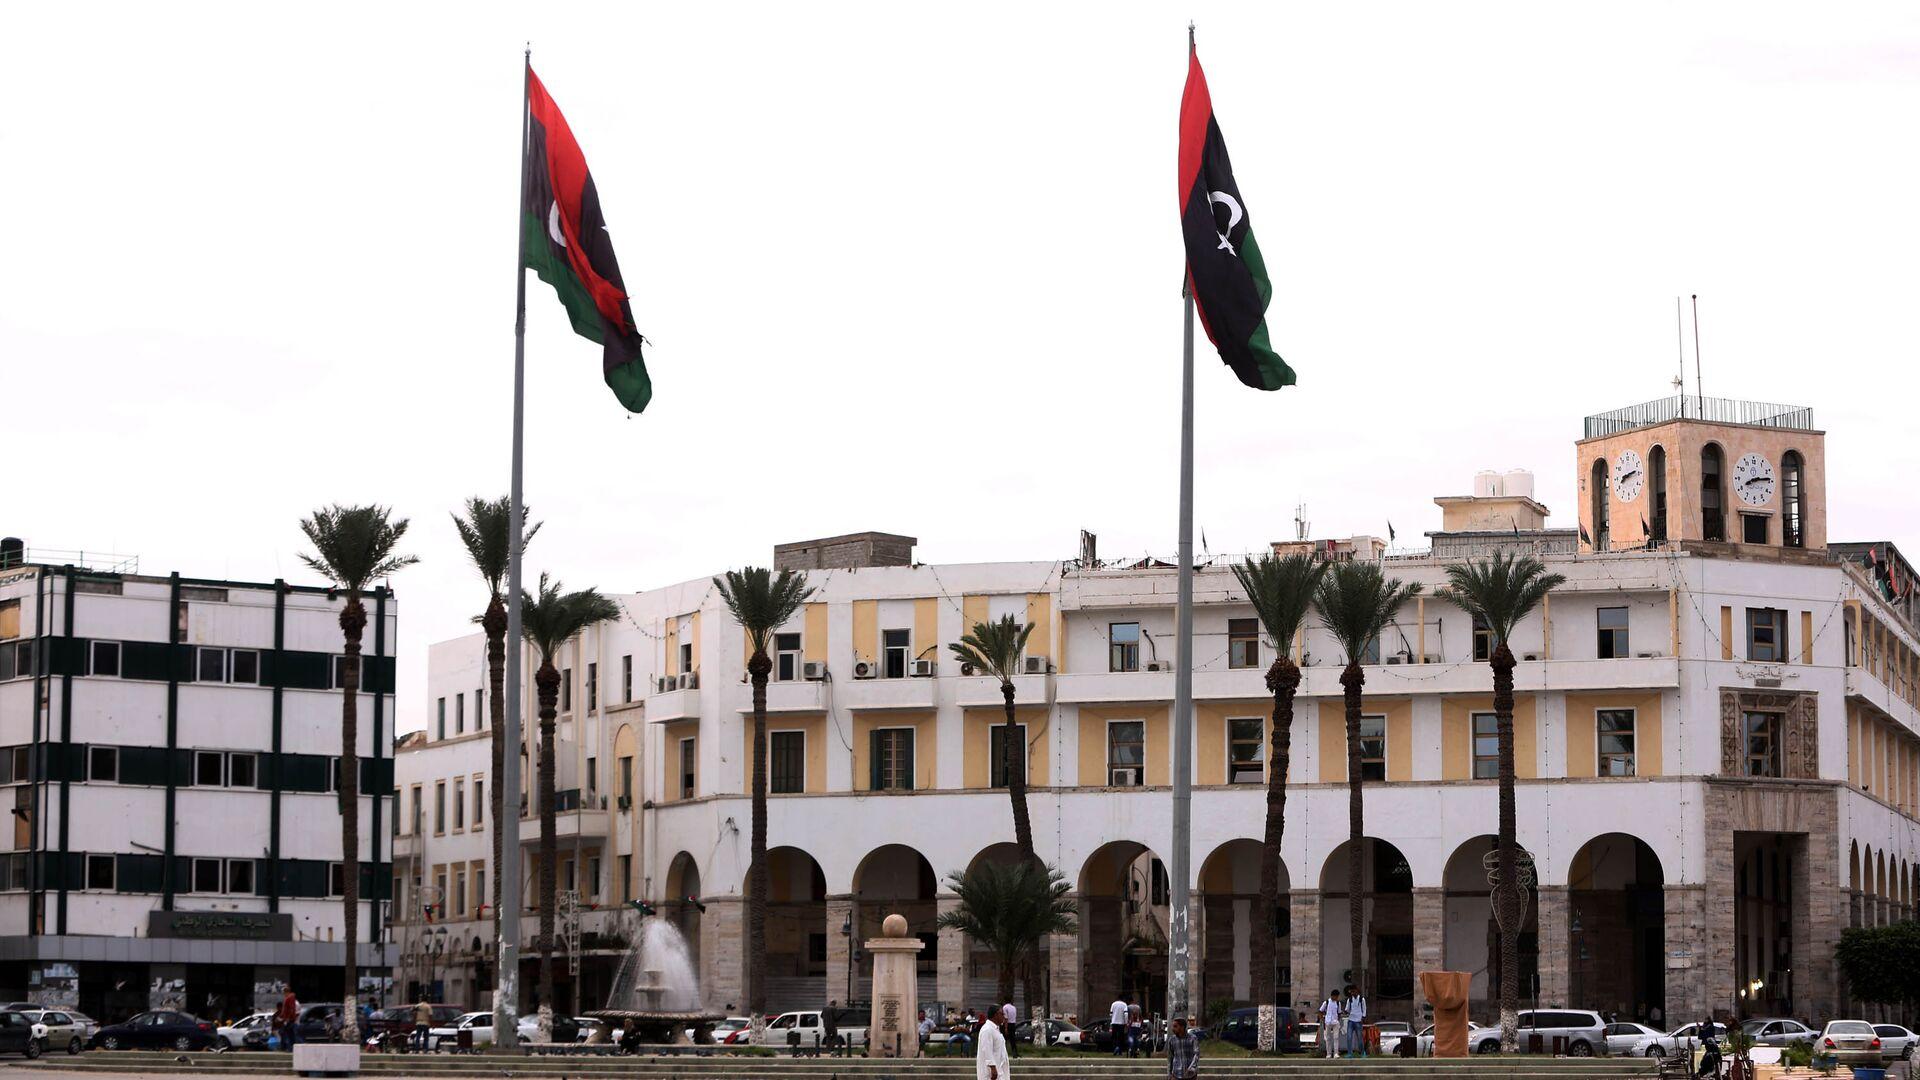 La piazza Martyrs a Tripoli, Libia - Sputnik Italia, 1920, 21.06.2021